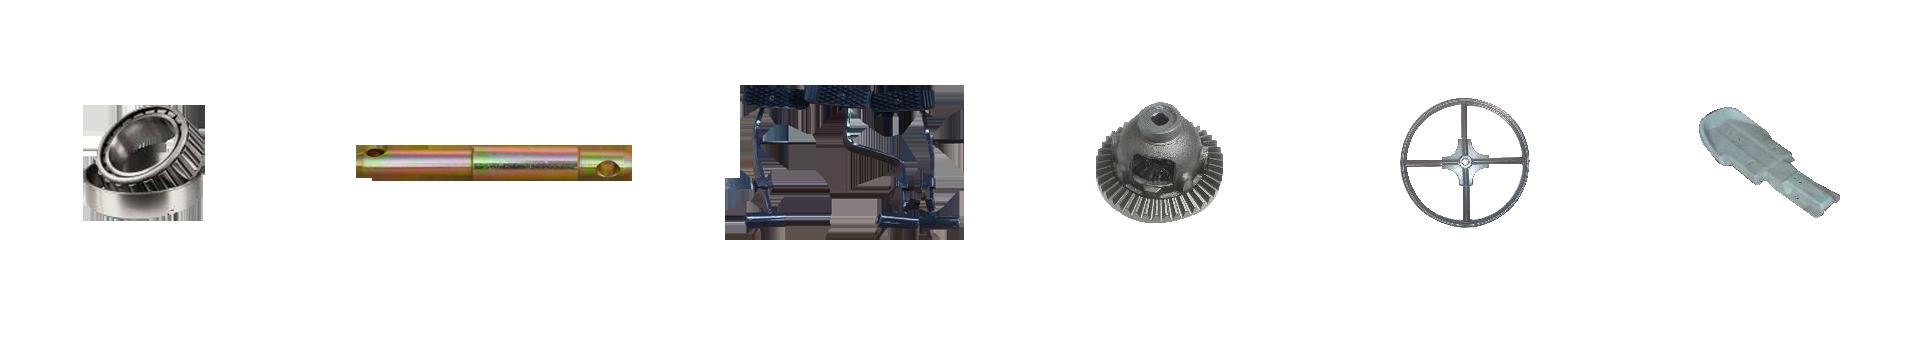 Kukje Tractor Parts : Keumyu